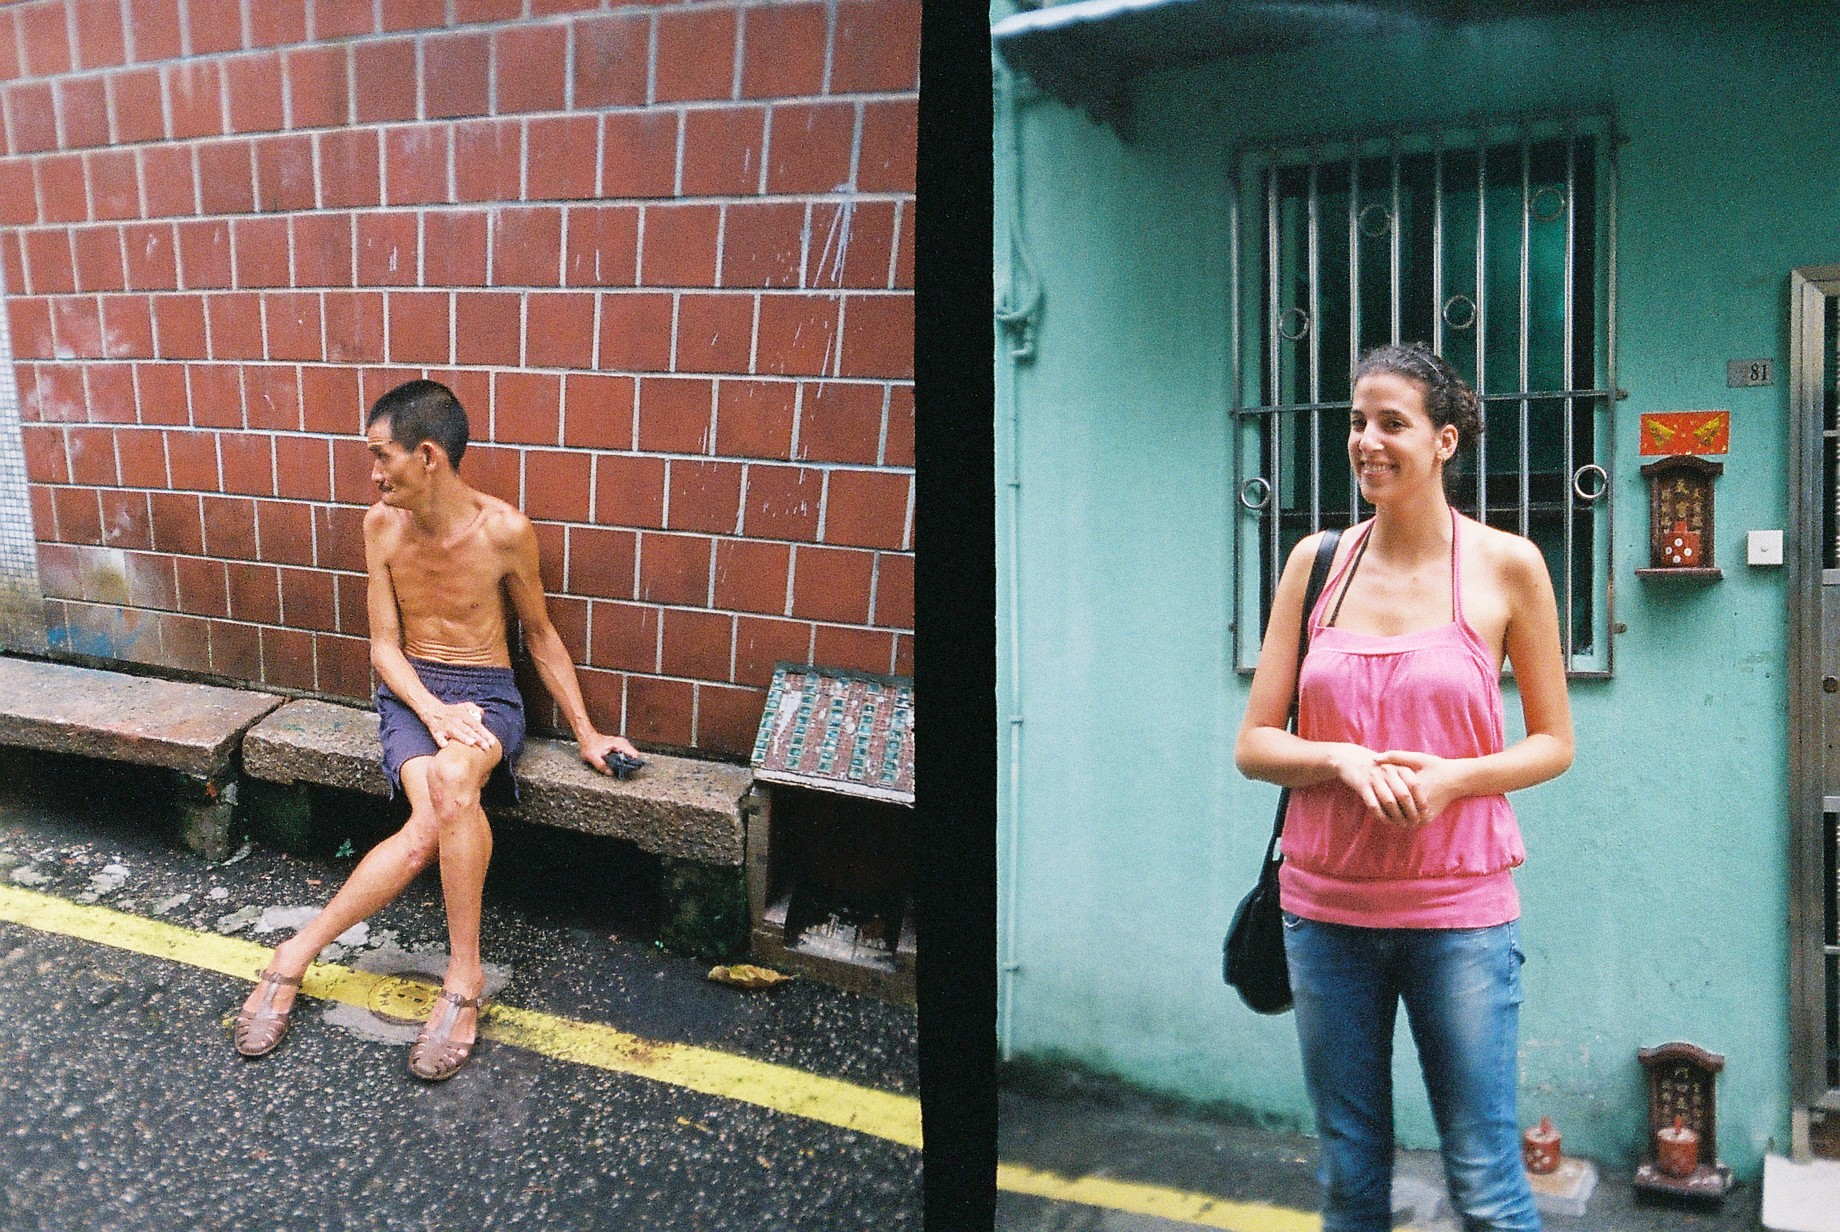 ...I lived on this street - Macau (China), 2009-2013